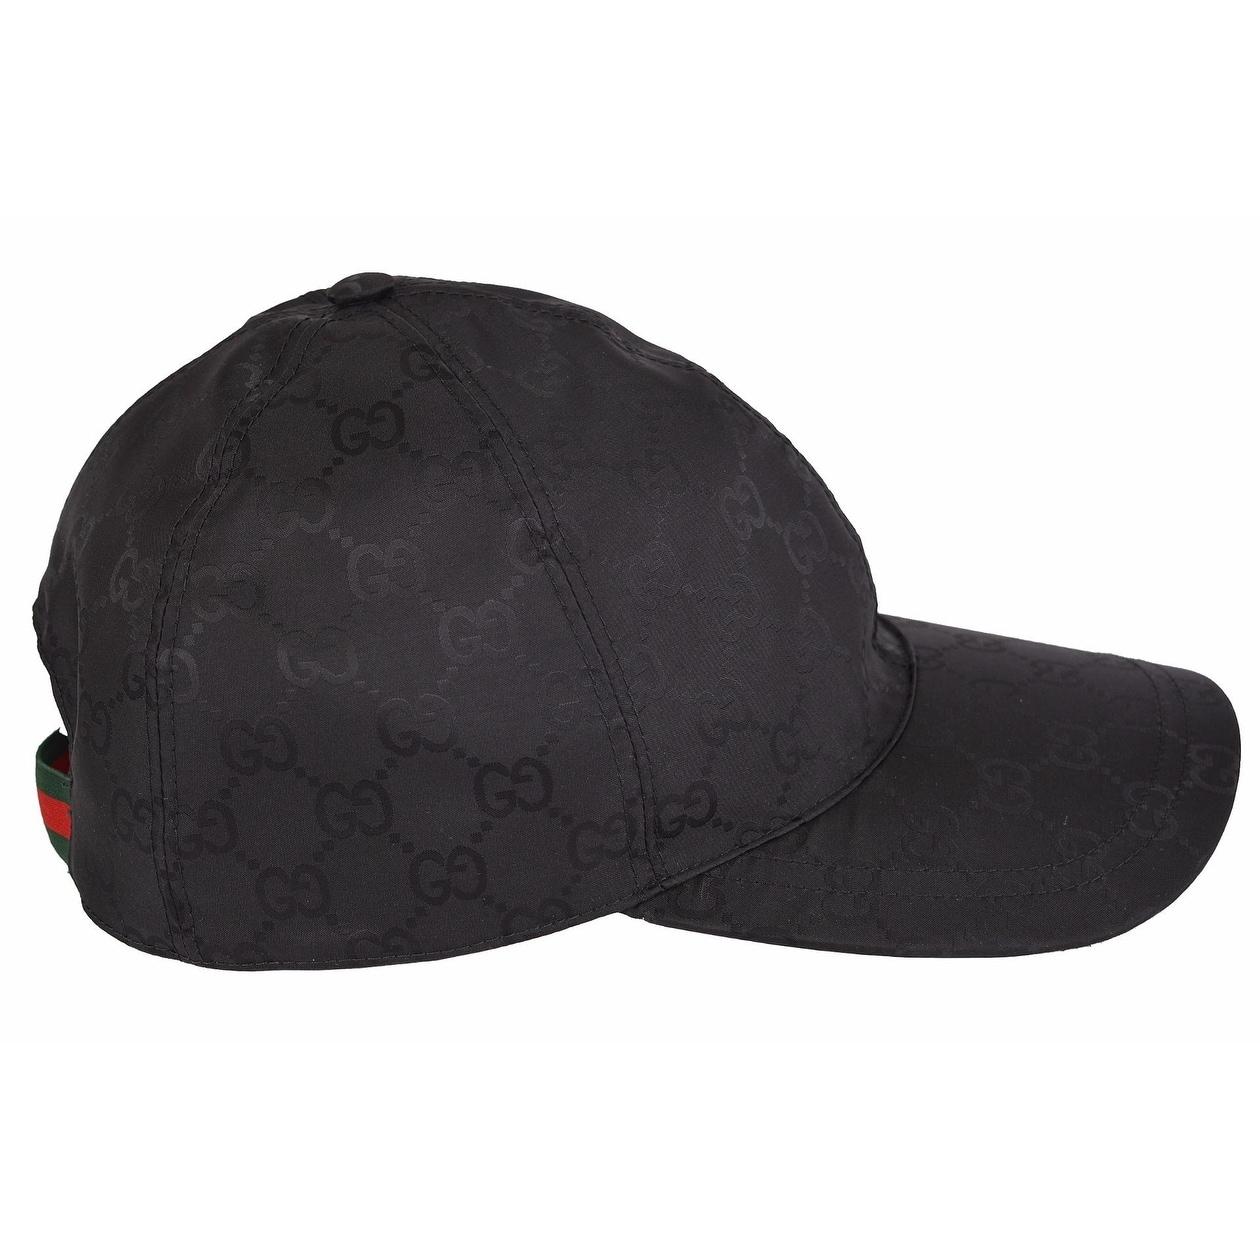 be58d320 Shop Gucci Men's 387578 Black Nylon GG Guccissima Web Stripe Baseball Cap  Hat S - Free Shipping Today - Overstock - 12733615